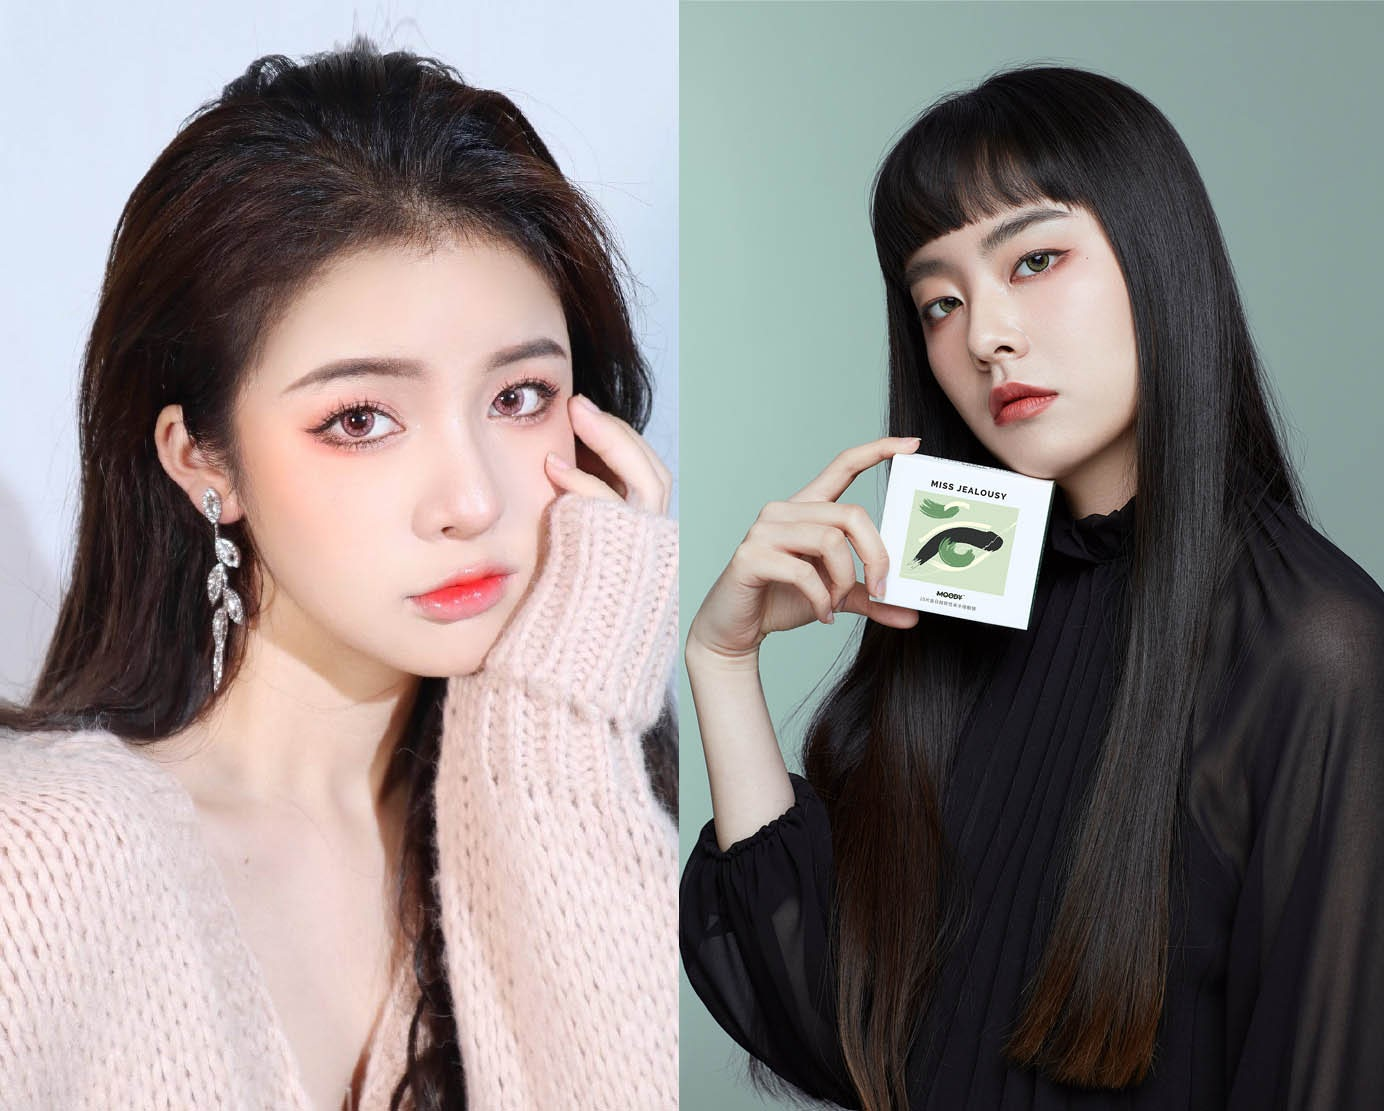 Models sporting coloured contacts by Kilala (L) and Moody (R). Kilala and Moody, Weibo.